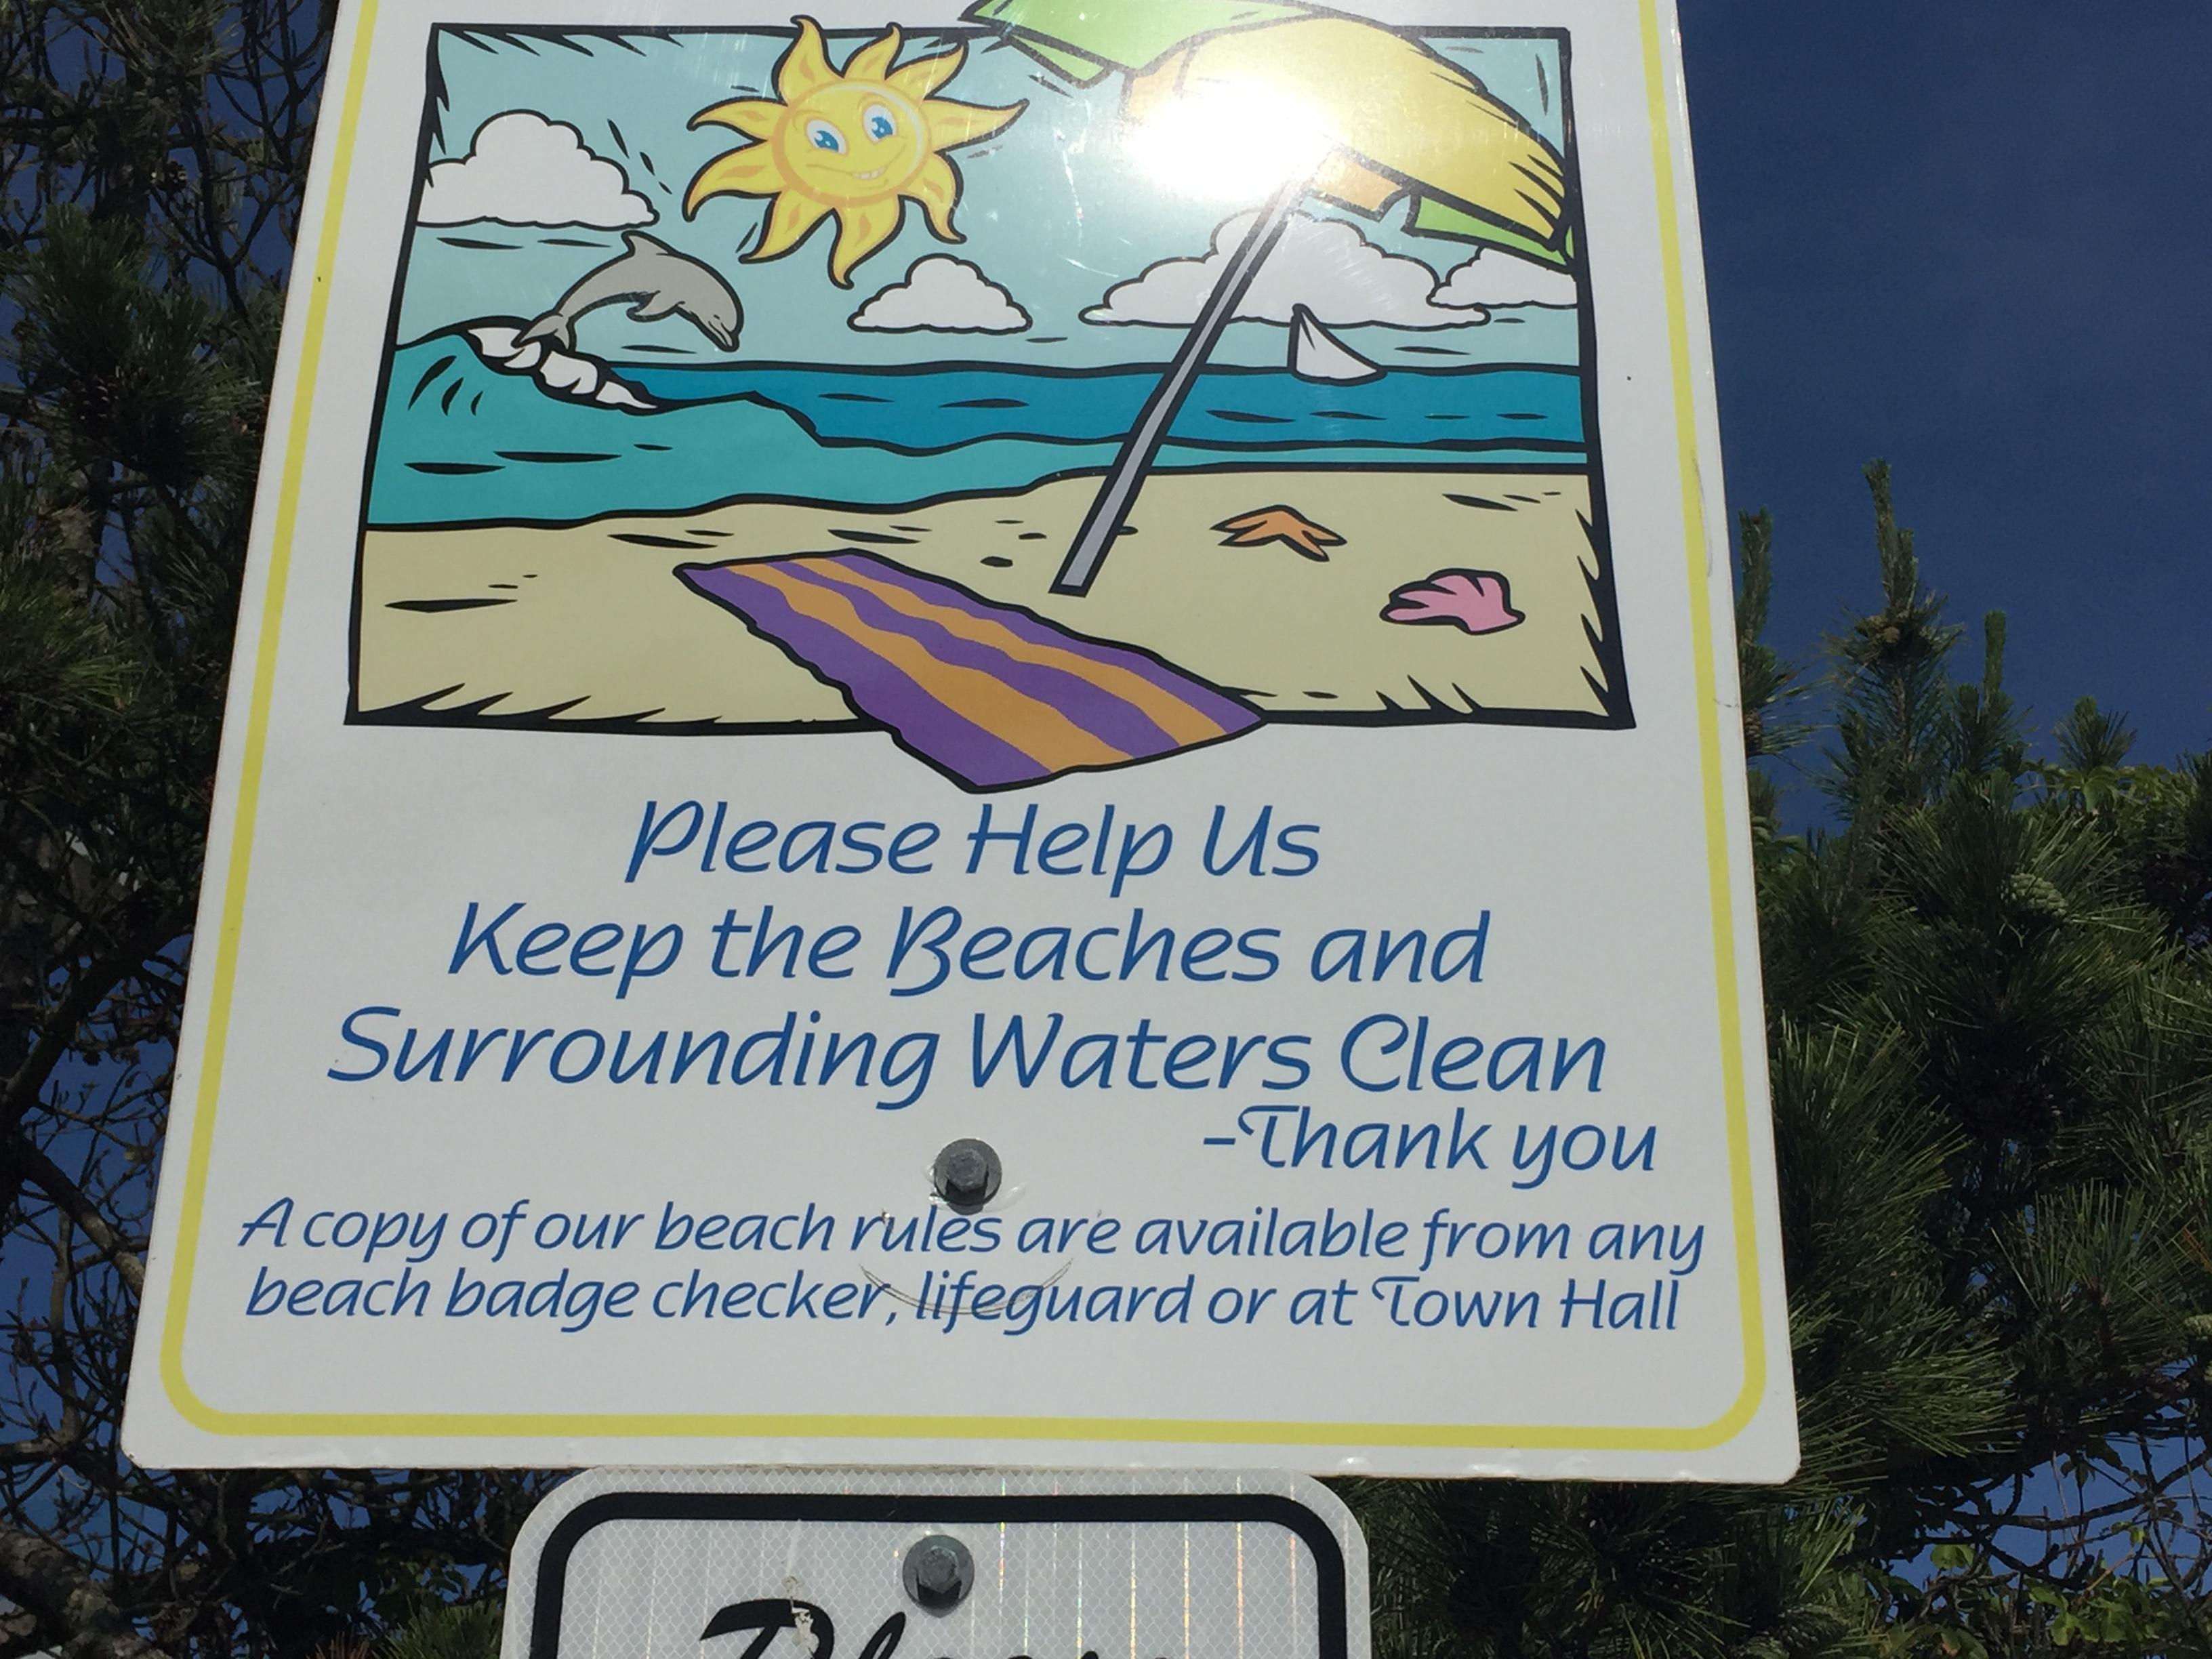 Long Beach Township S Rules Sign Photo Daniel Nee